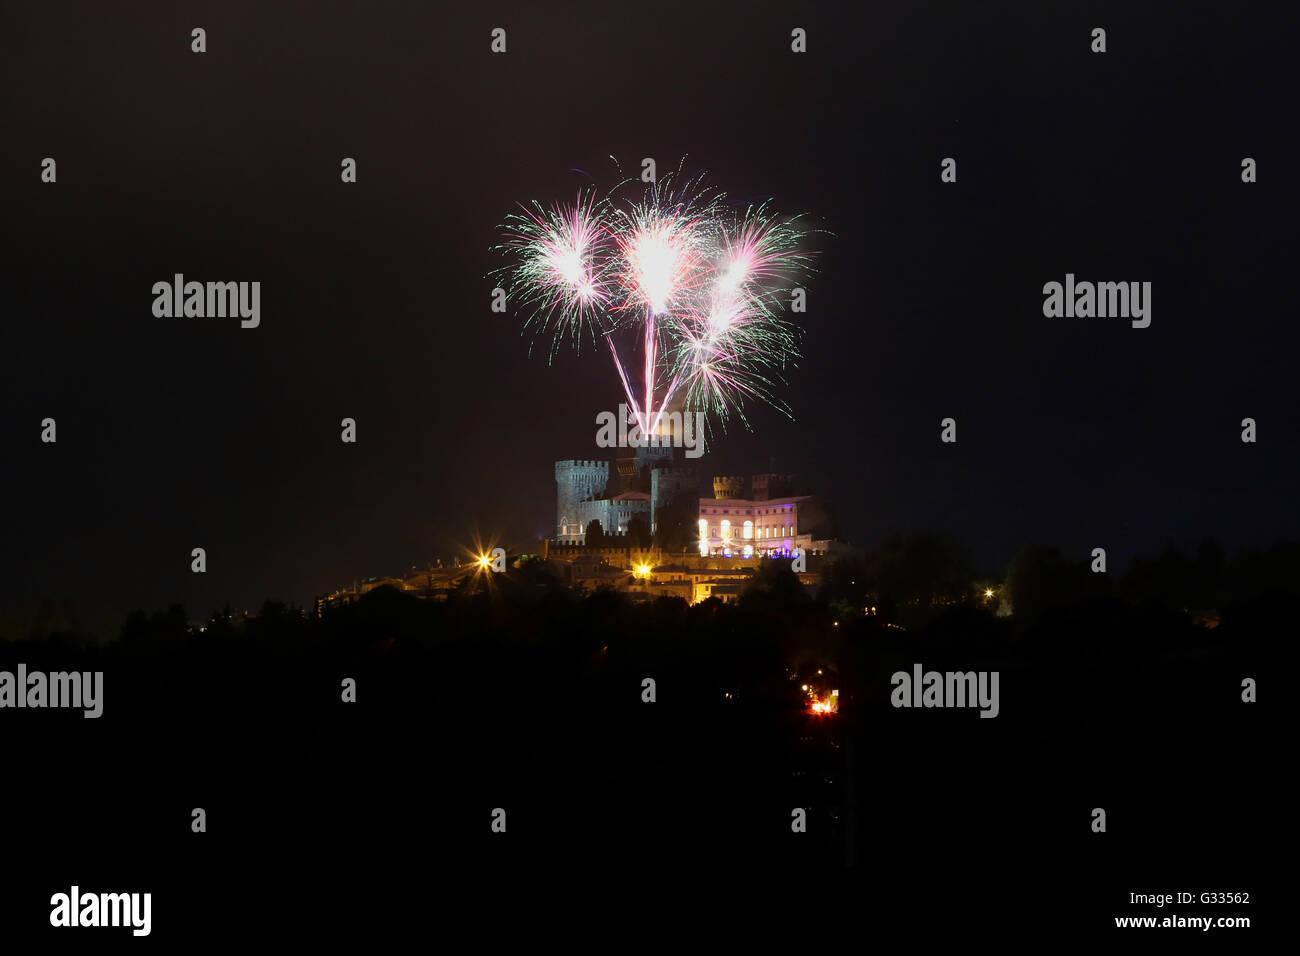 Torre Alfina, Italy, fireworks above the Castello di Torre Alfina Stock Photo